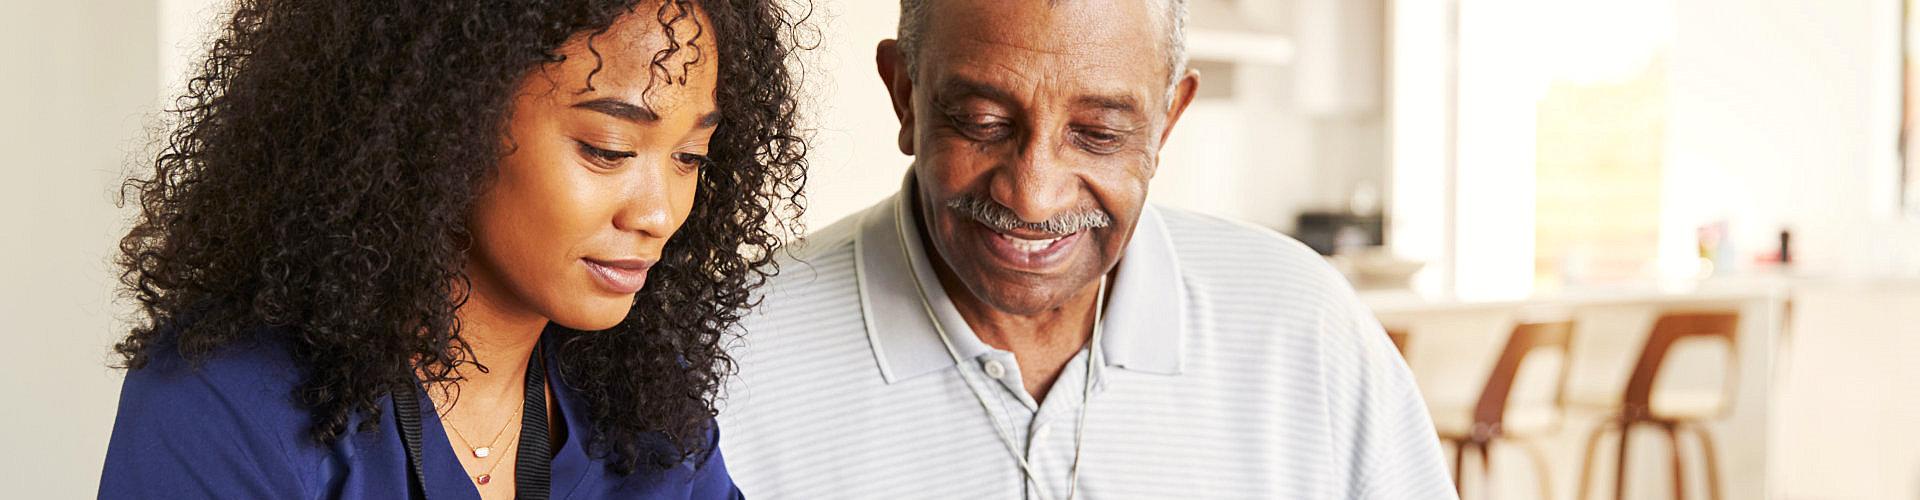 smiling senior man and caregiver